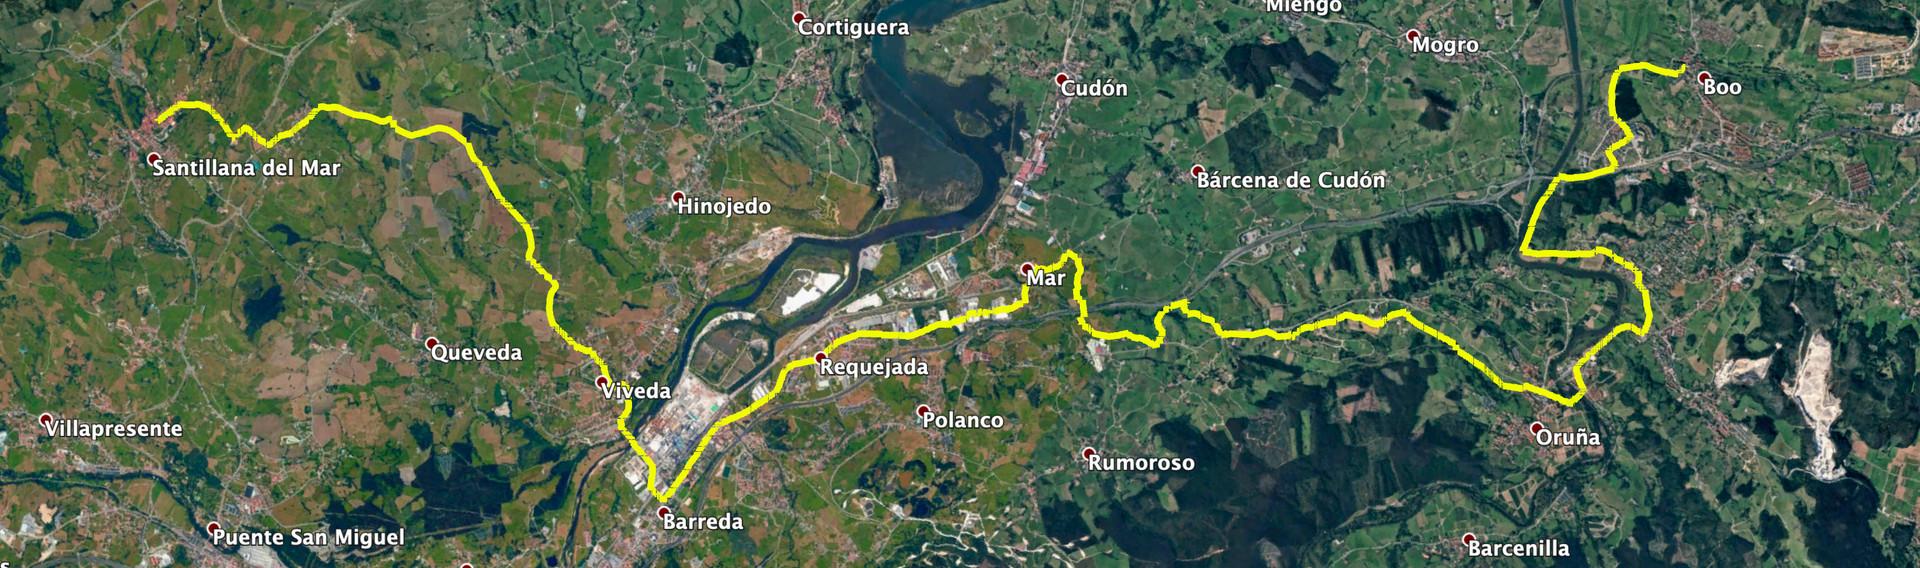 CN Day 12 Map.jpg